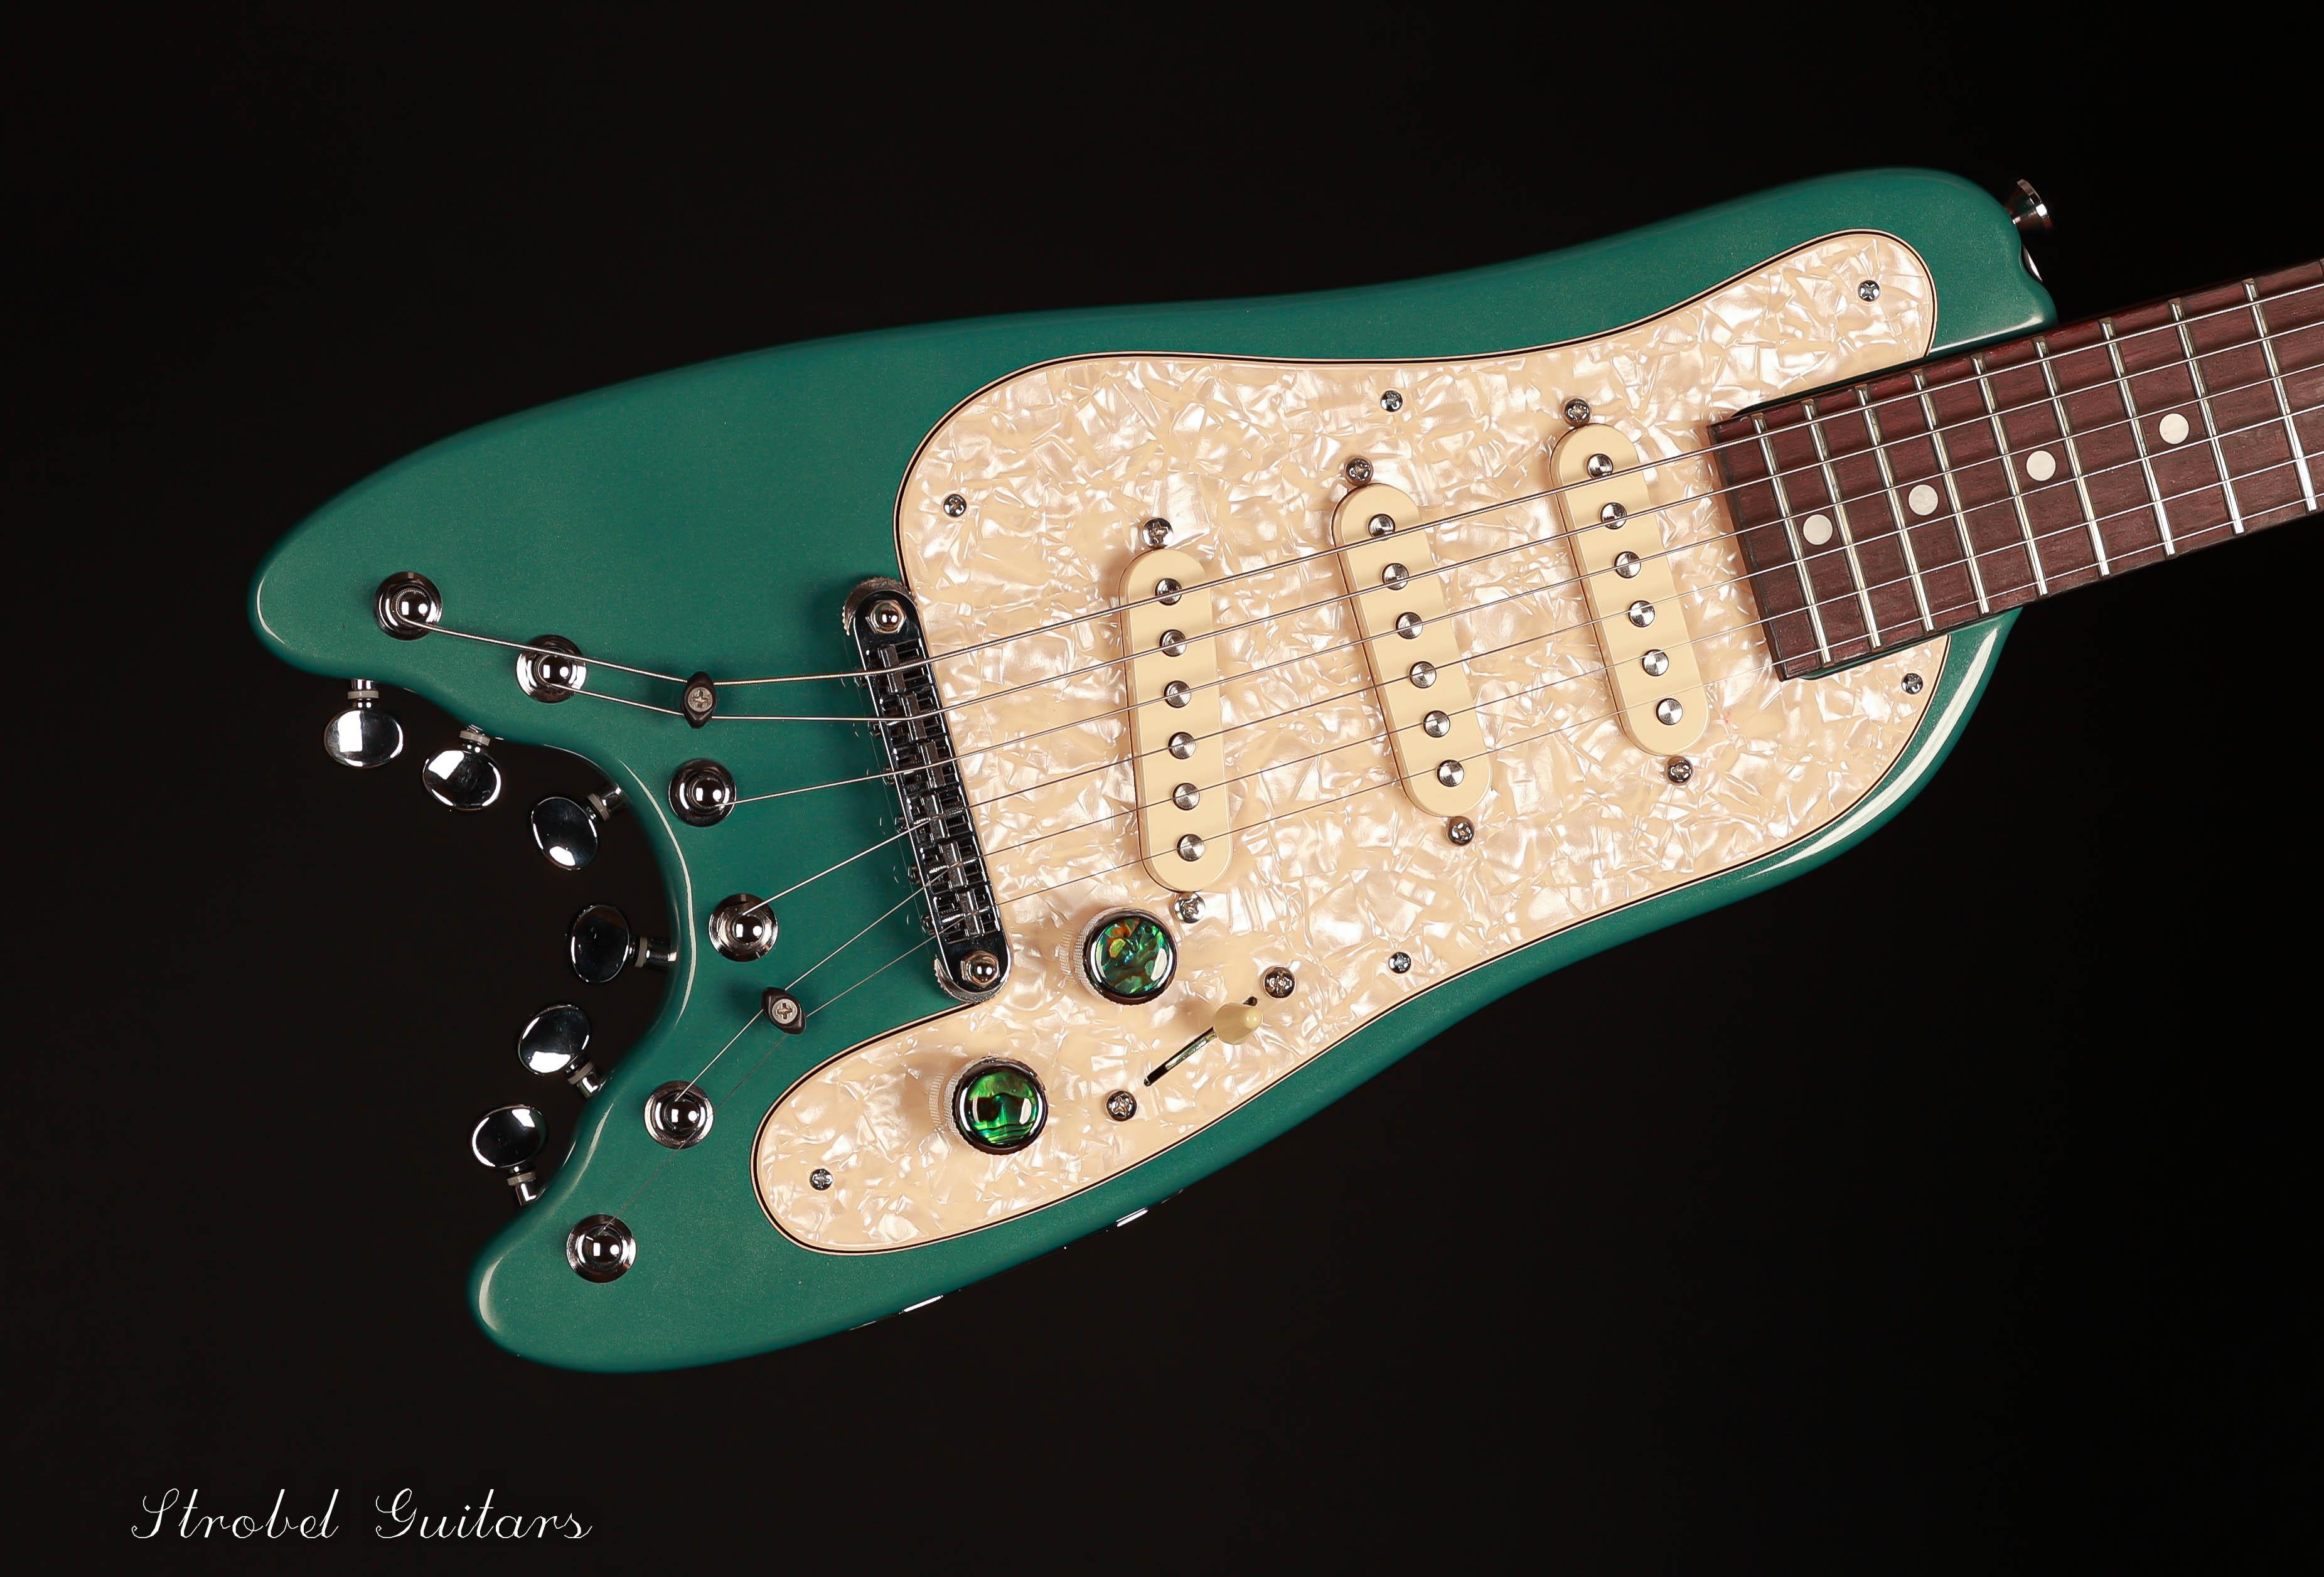 Strobel-Portable-Guitar-Easily-Detachable-Neck